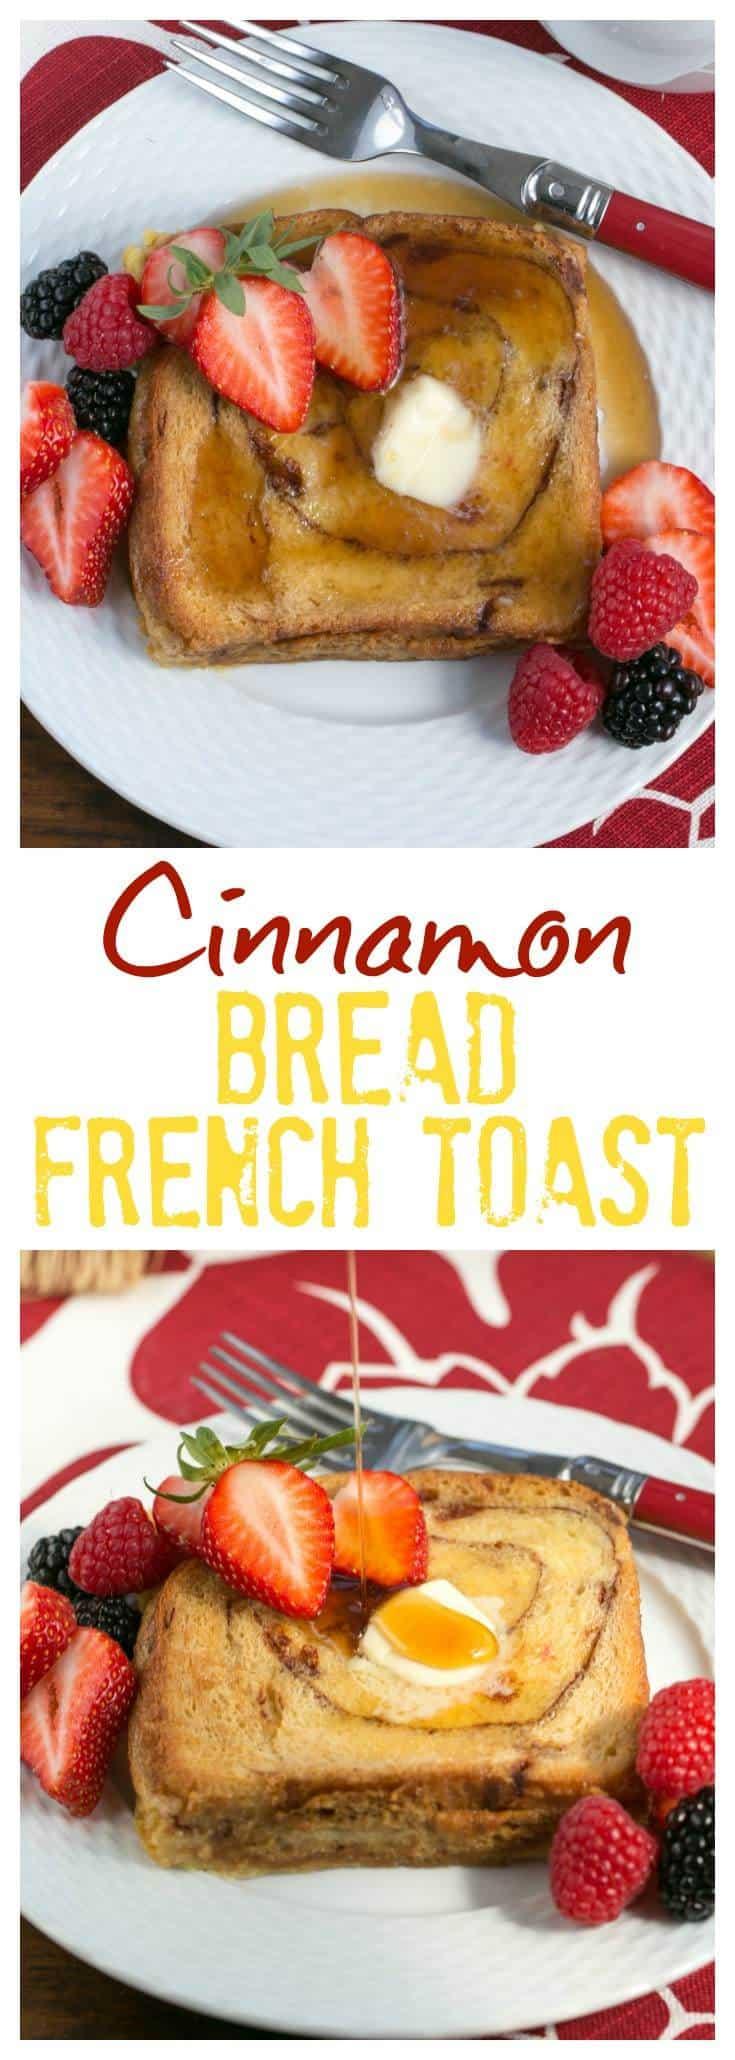 Overnight Cinnamon Bread French Toast - a scrumptious, make ahead brunch dish! #breakfast #brunch #frenchtoast #casserole